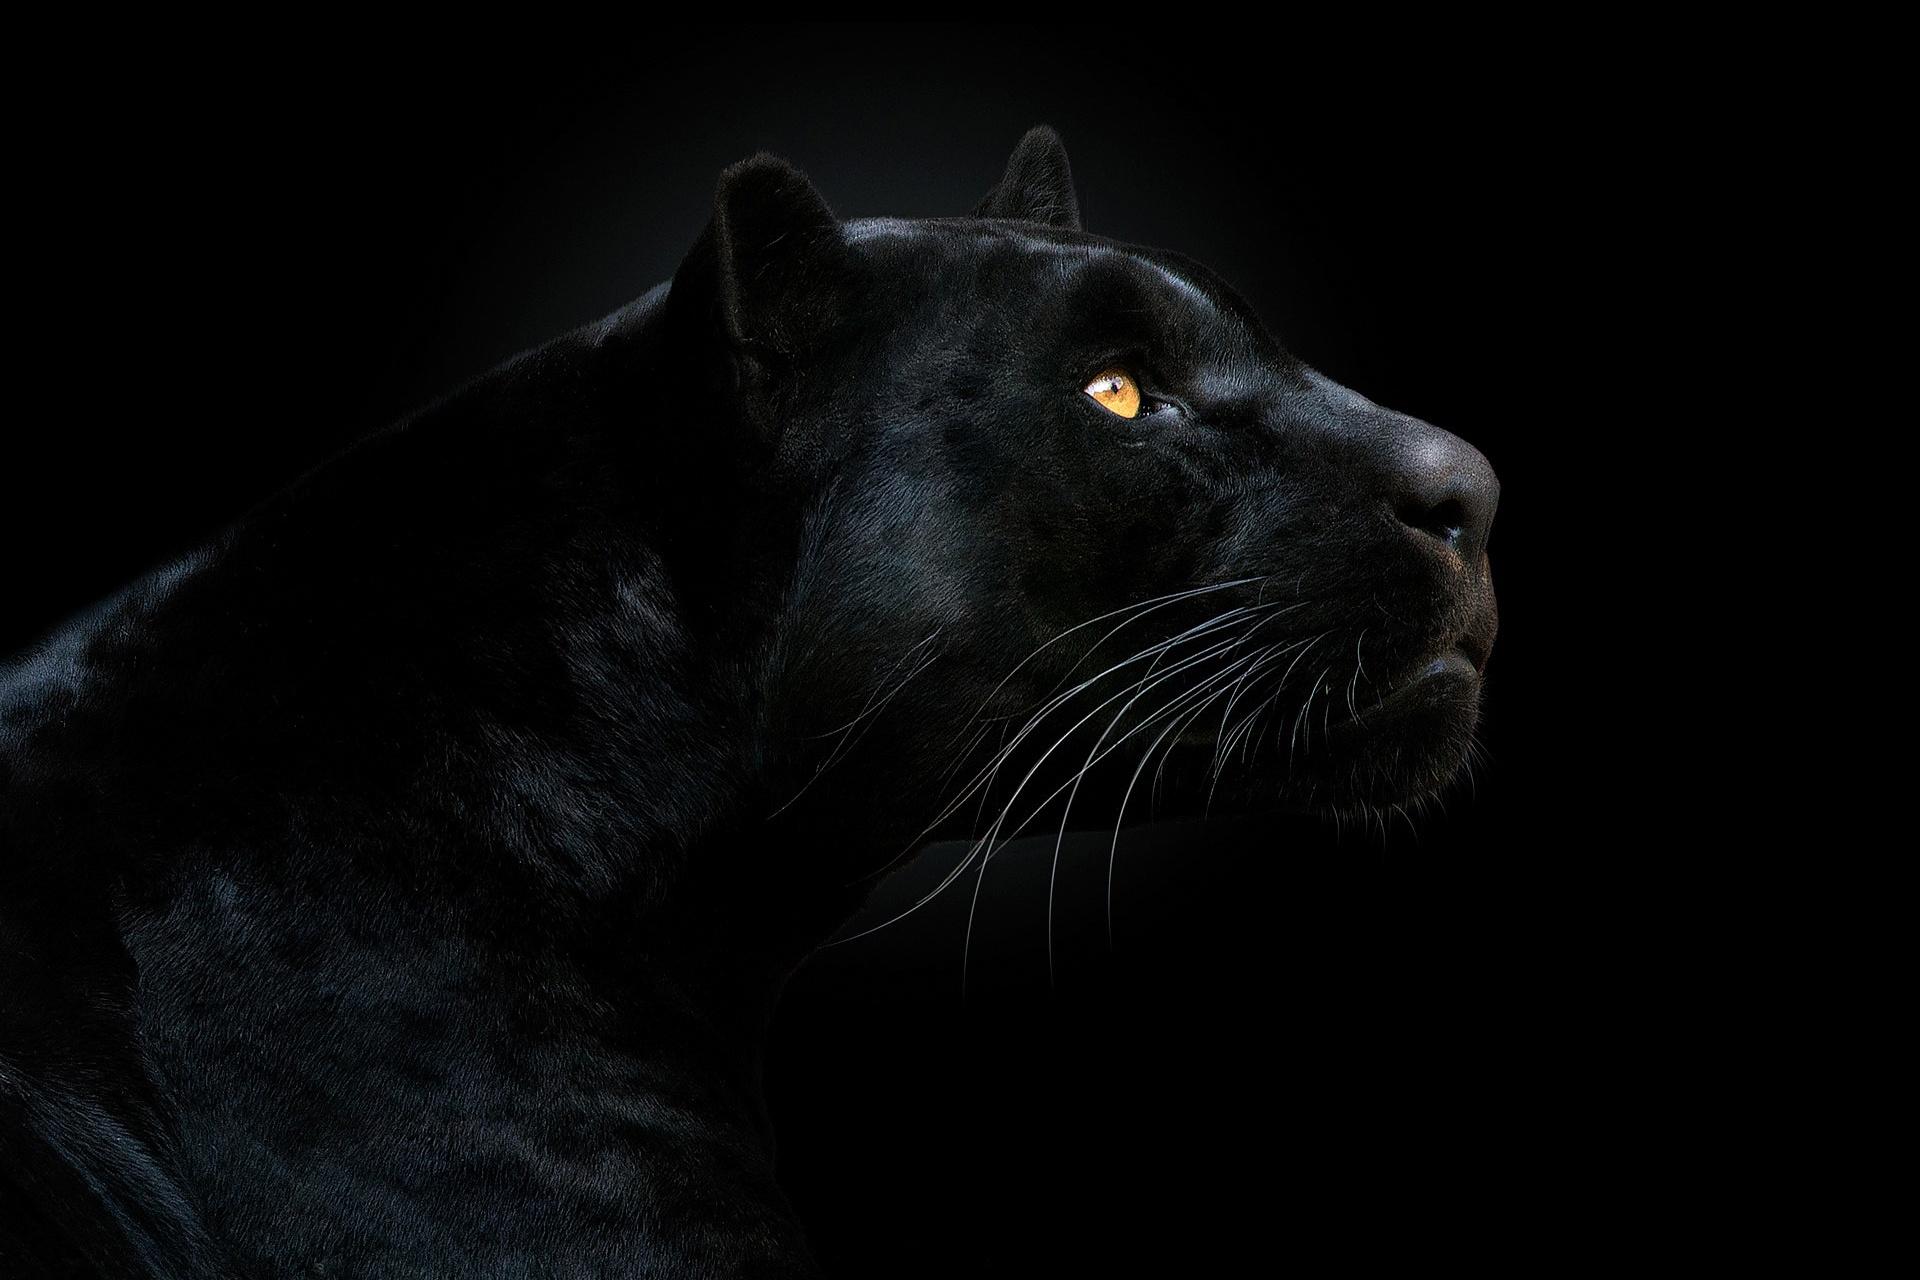 Дизайн фото пантера на черном фоне про